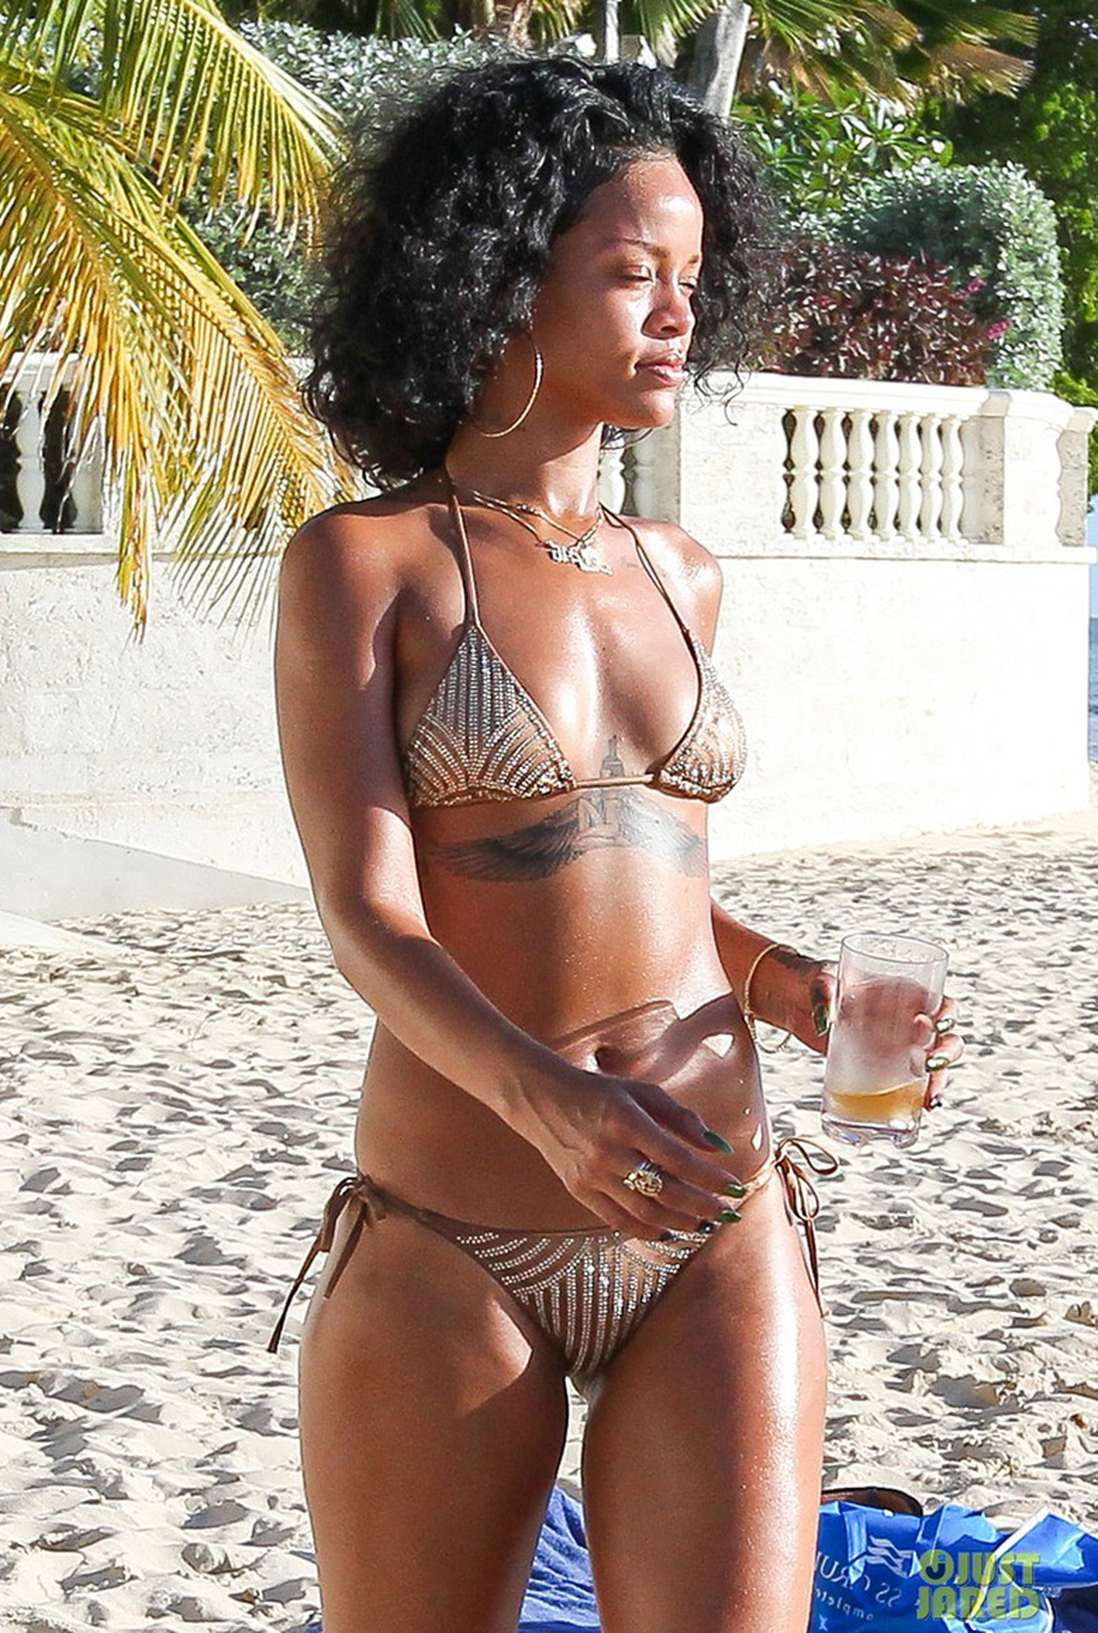 Sweet ebony babe Rihanna Rimes taking shower in her thong bikini  325677